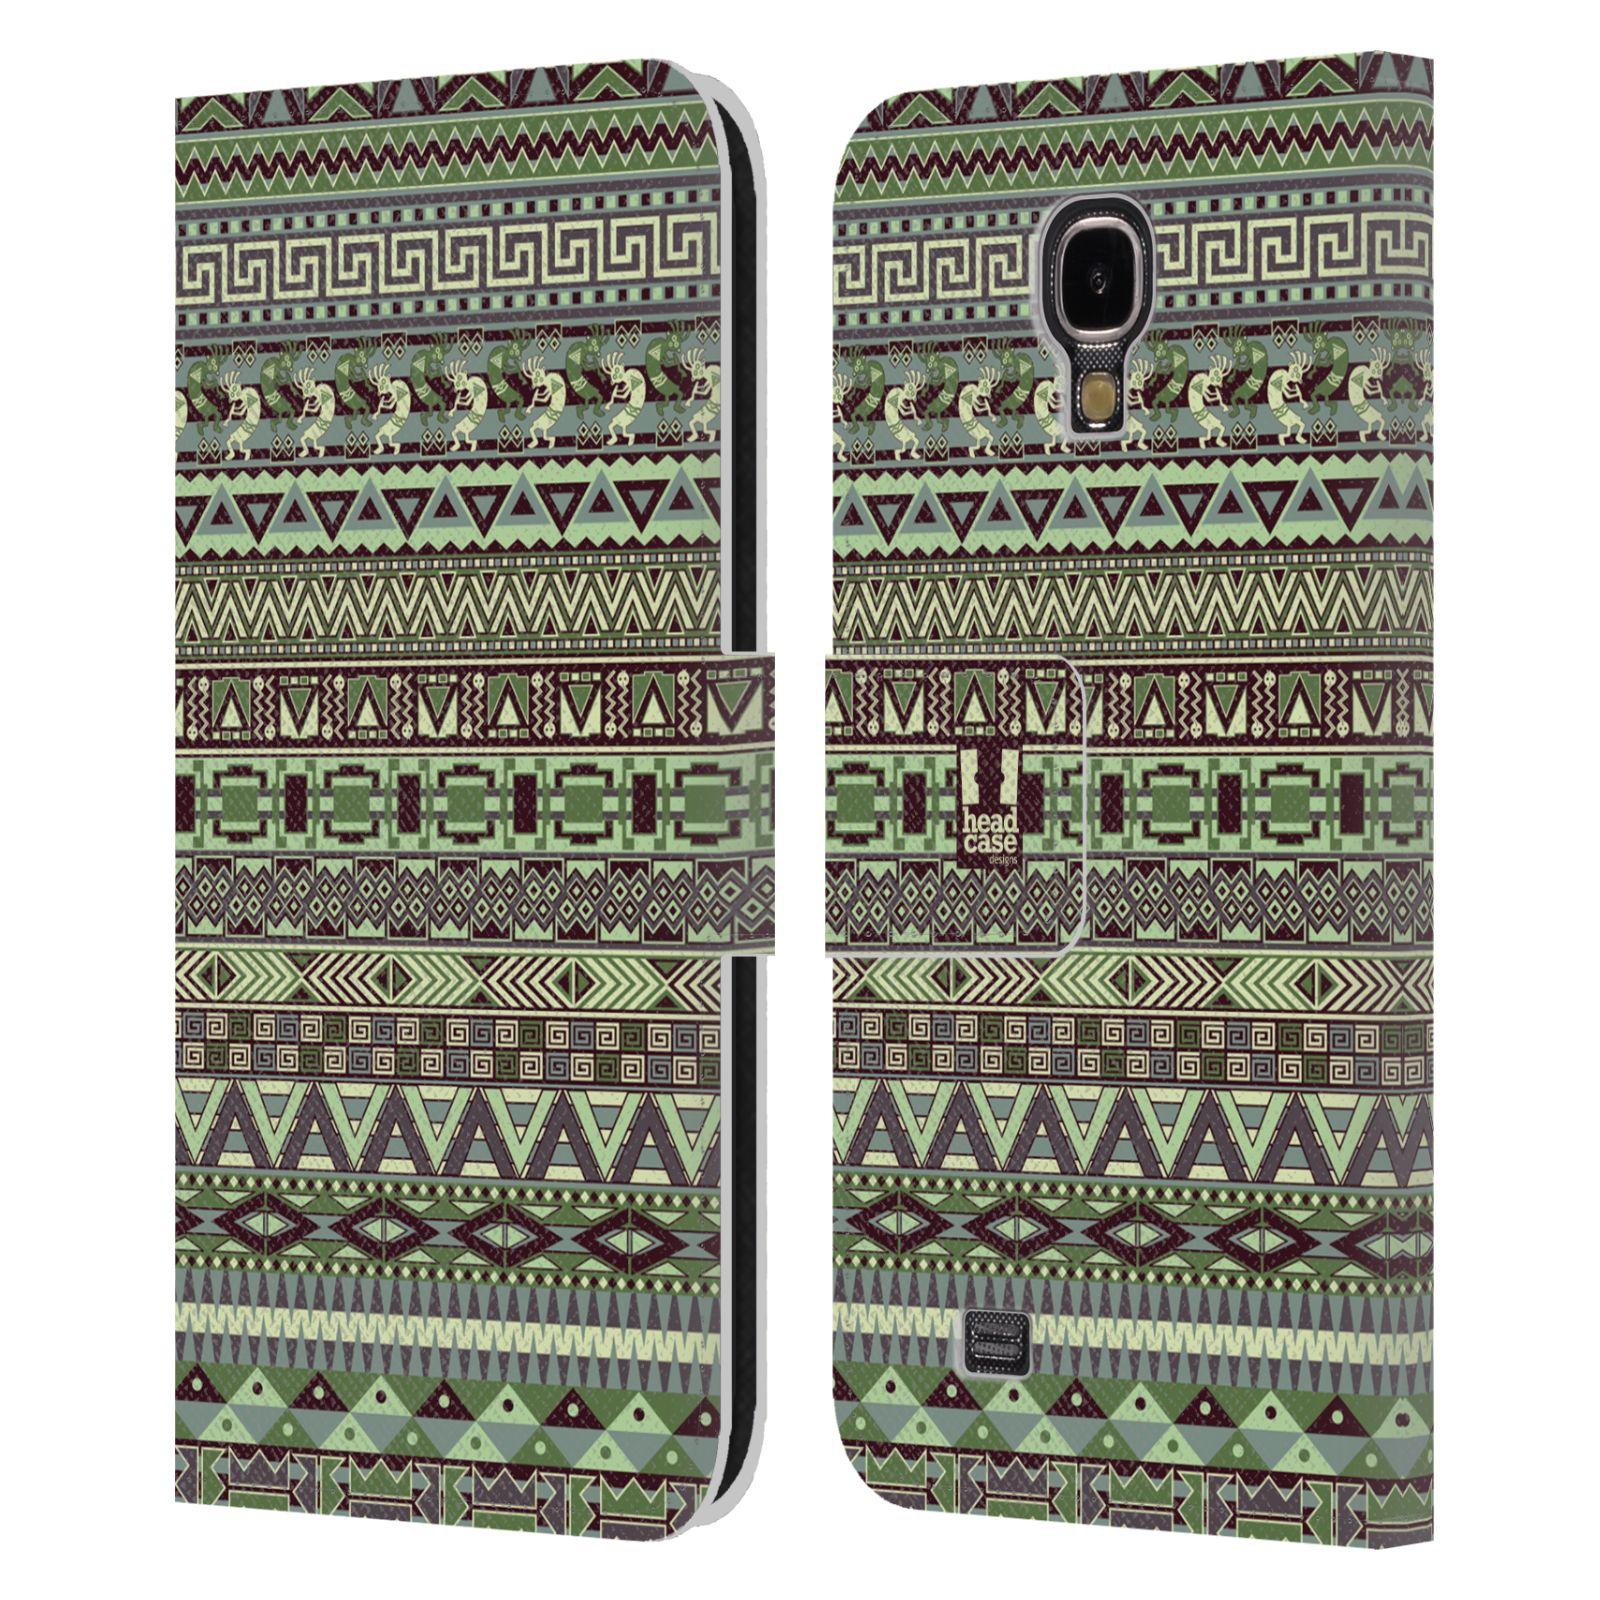 HEAD CASE Flipové pouzdro pro mobil Samsung Galaxy S4 Indiánský vzor GREEN zelená